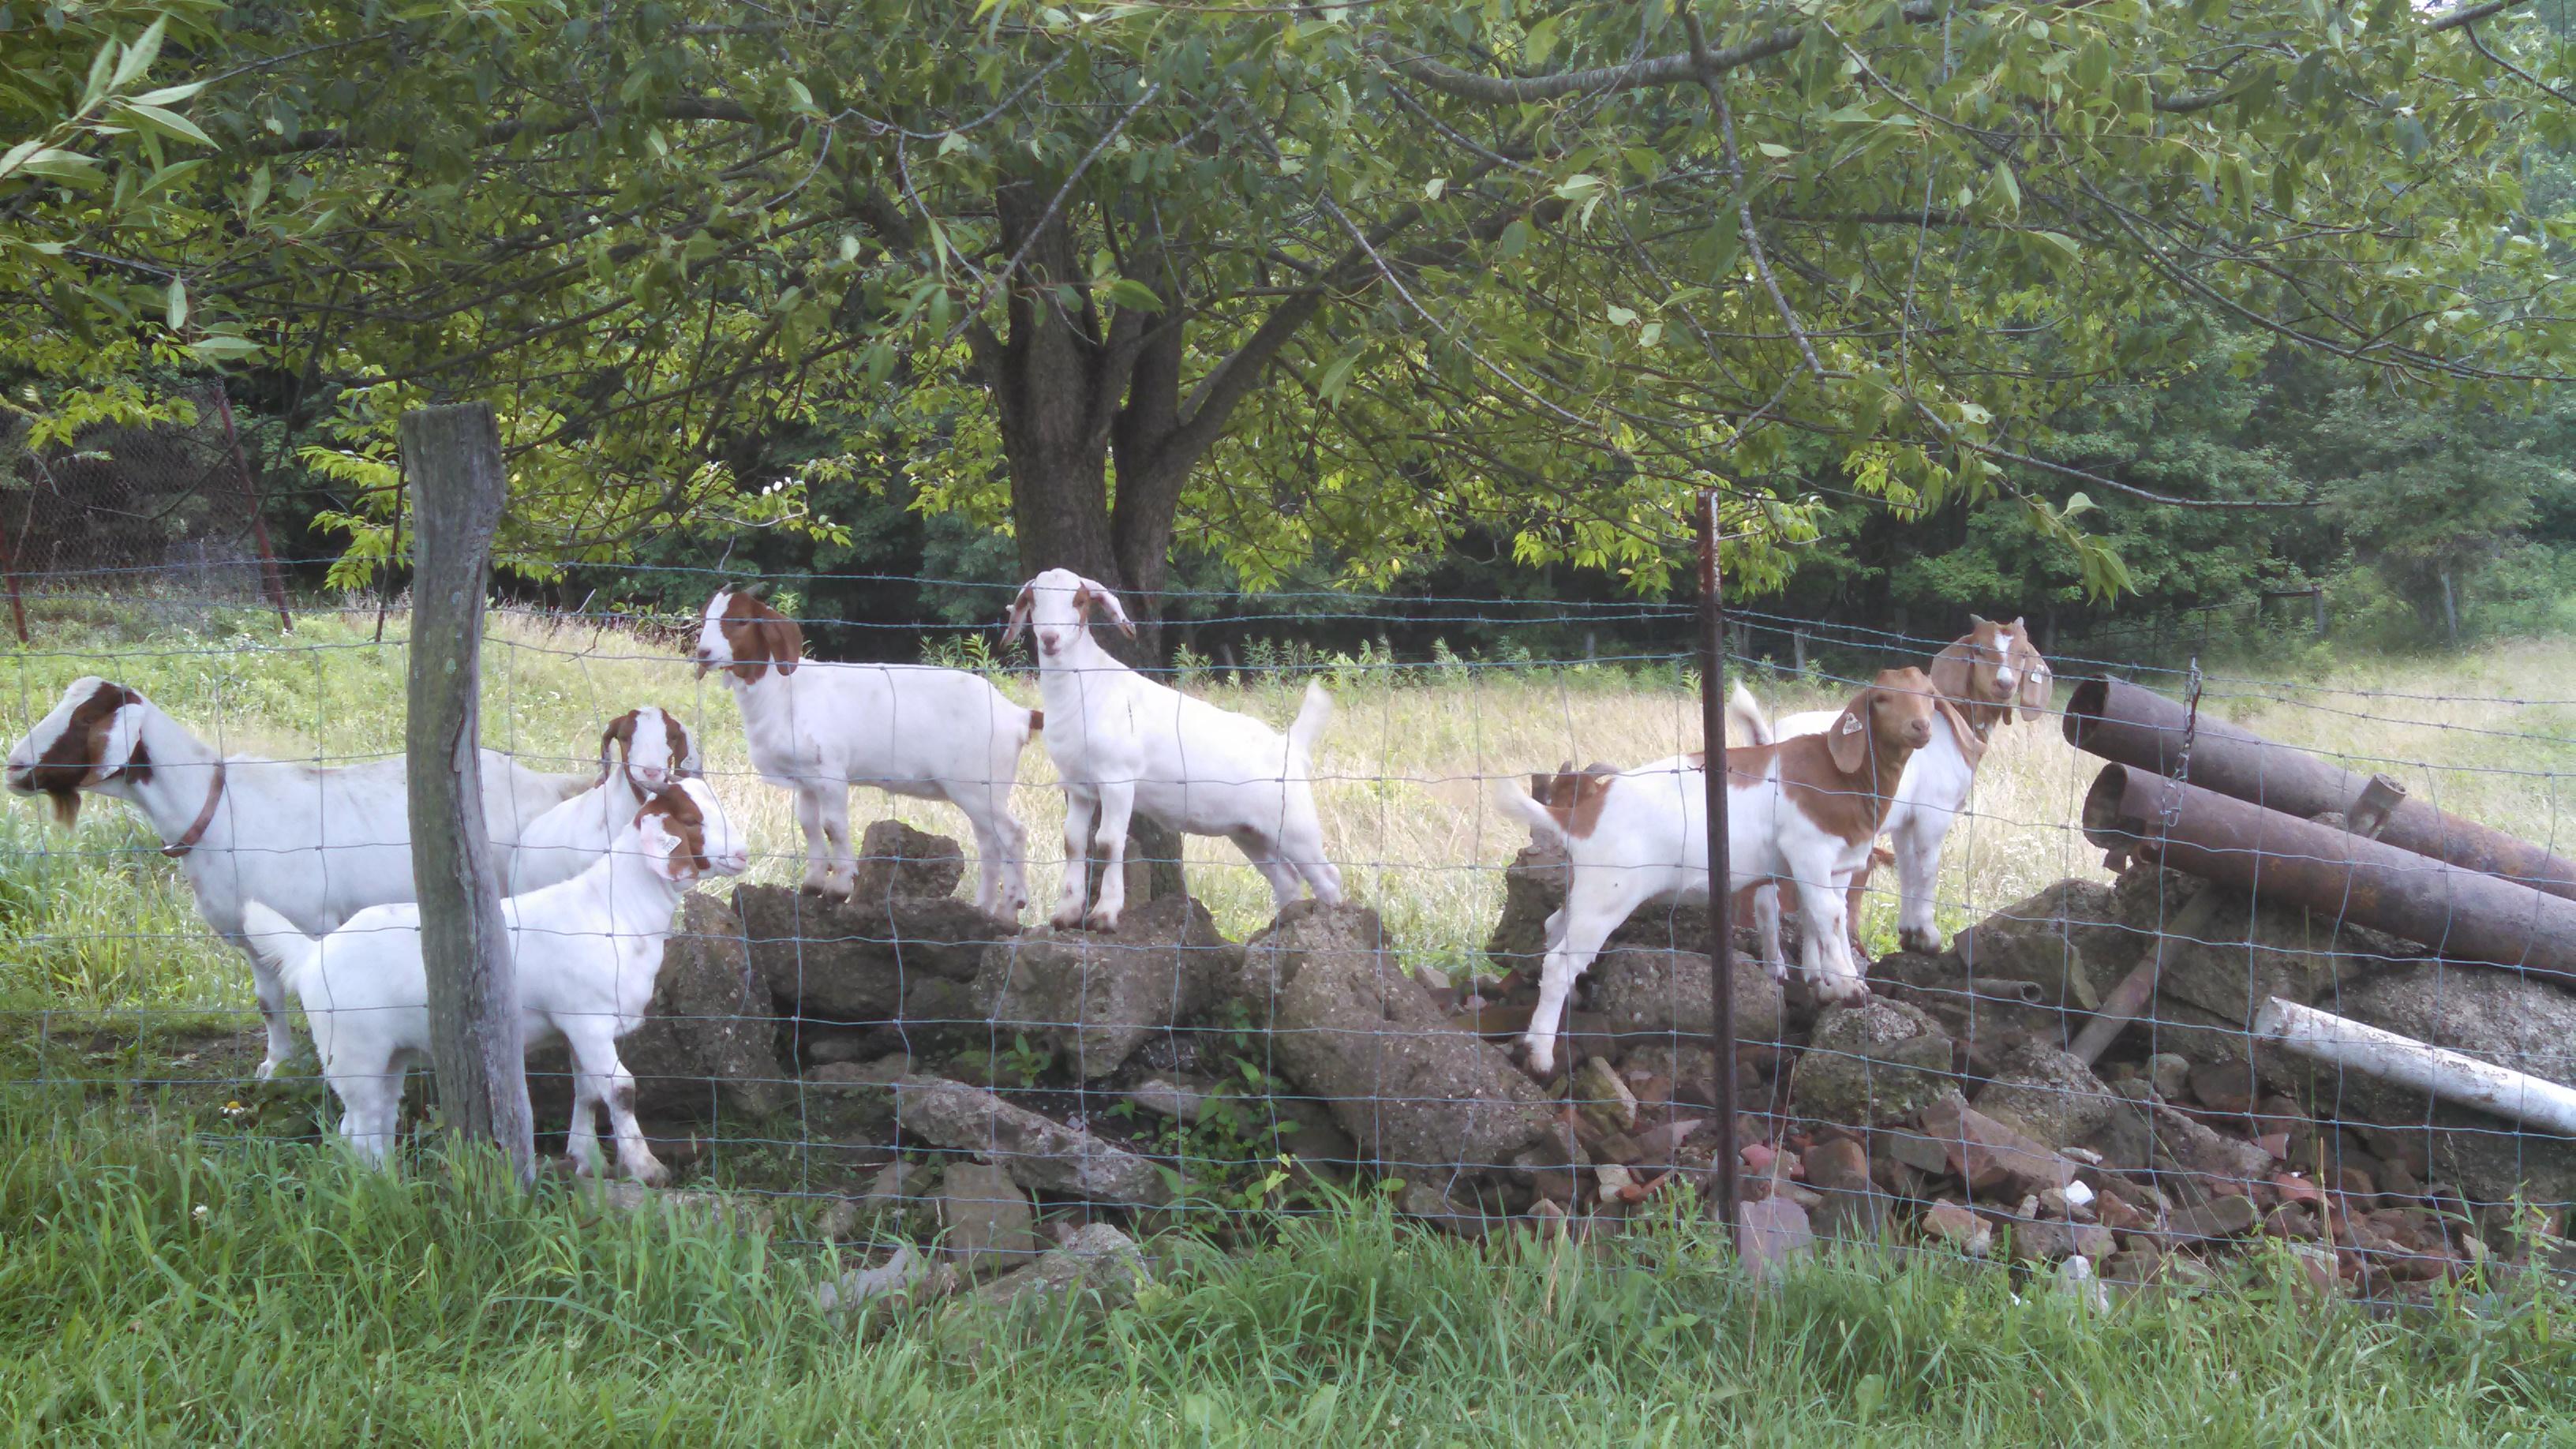 July 07th, Goats